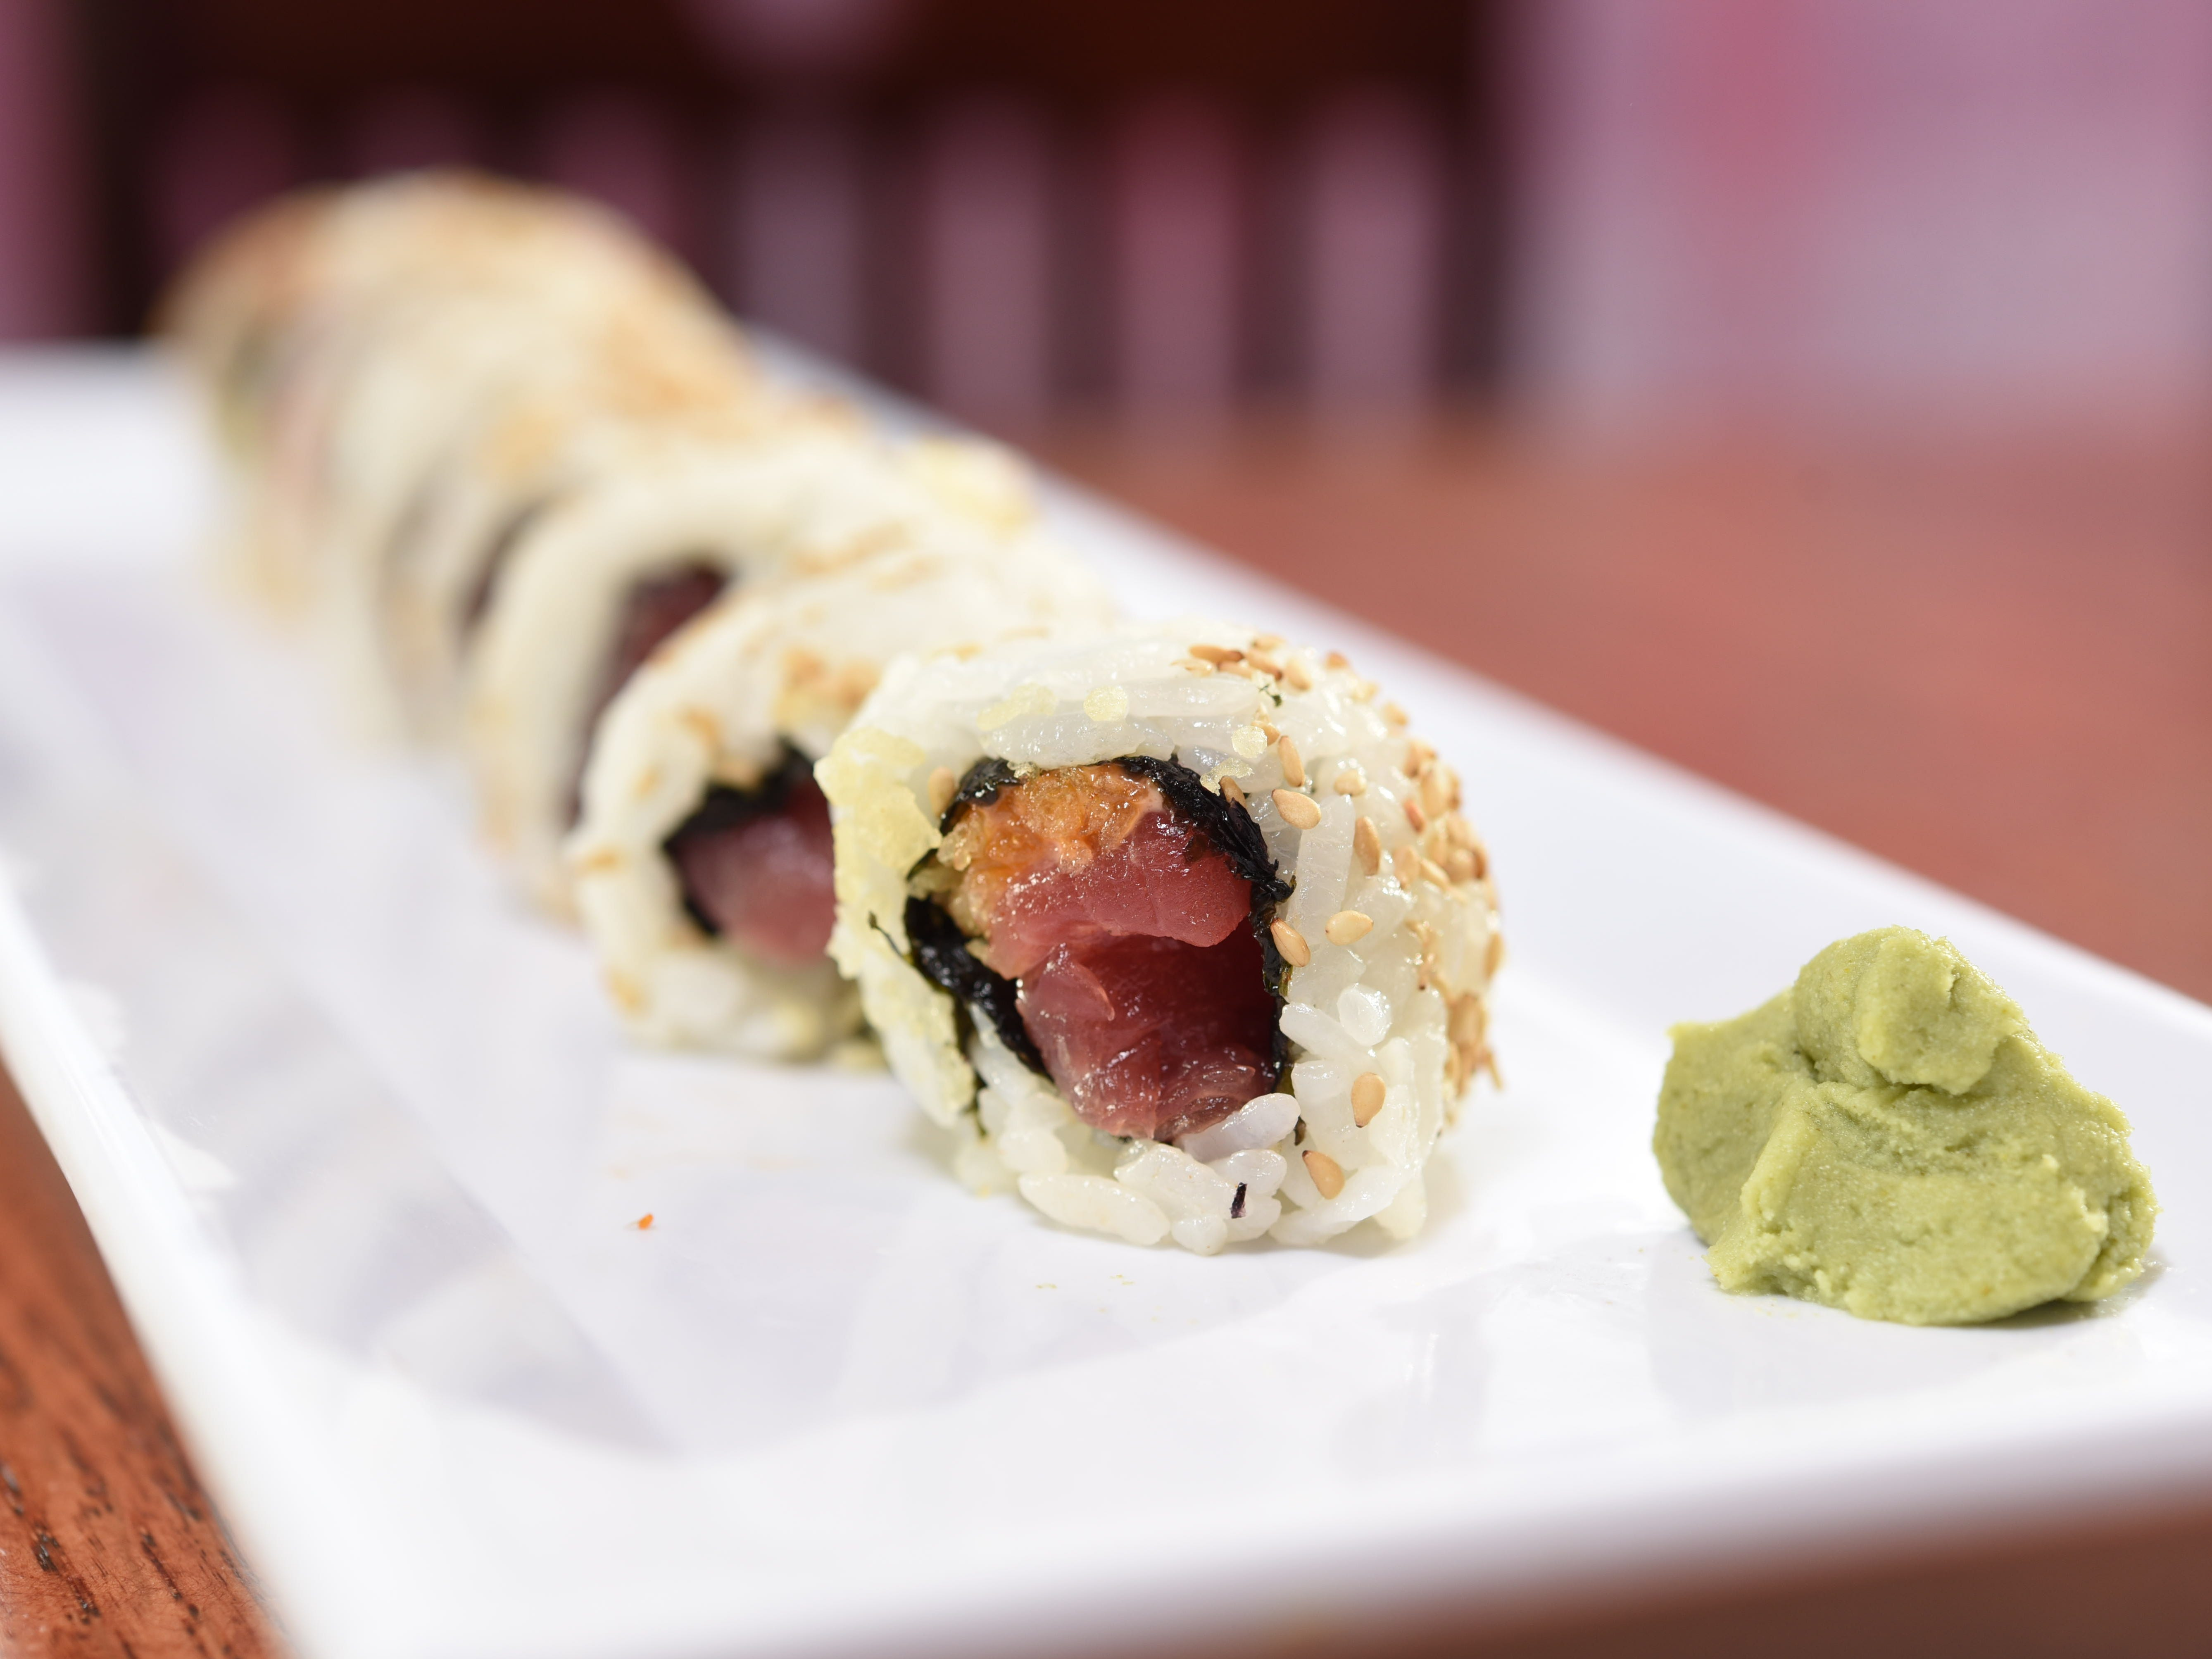 One of the many fantastic sushi rolls at Sakura Bana in Ridgewood